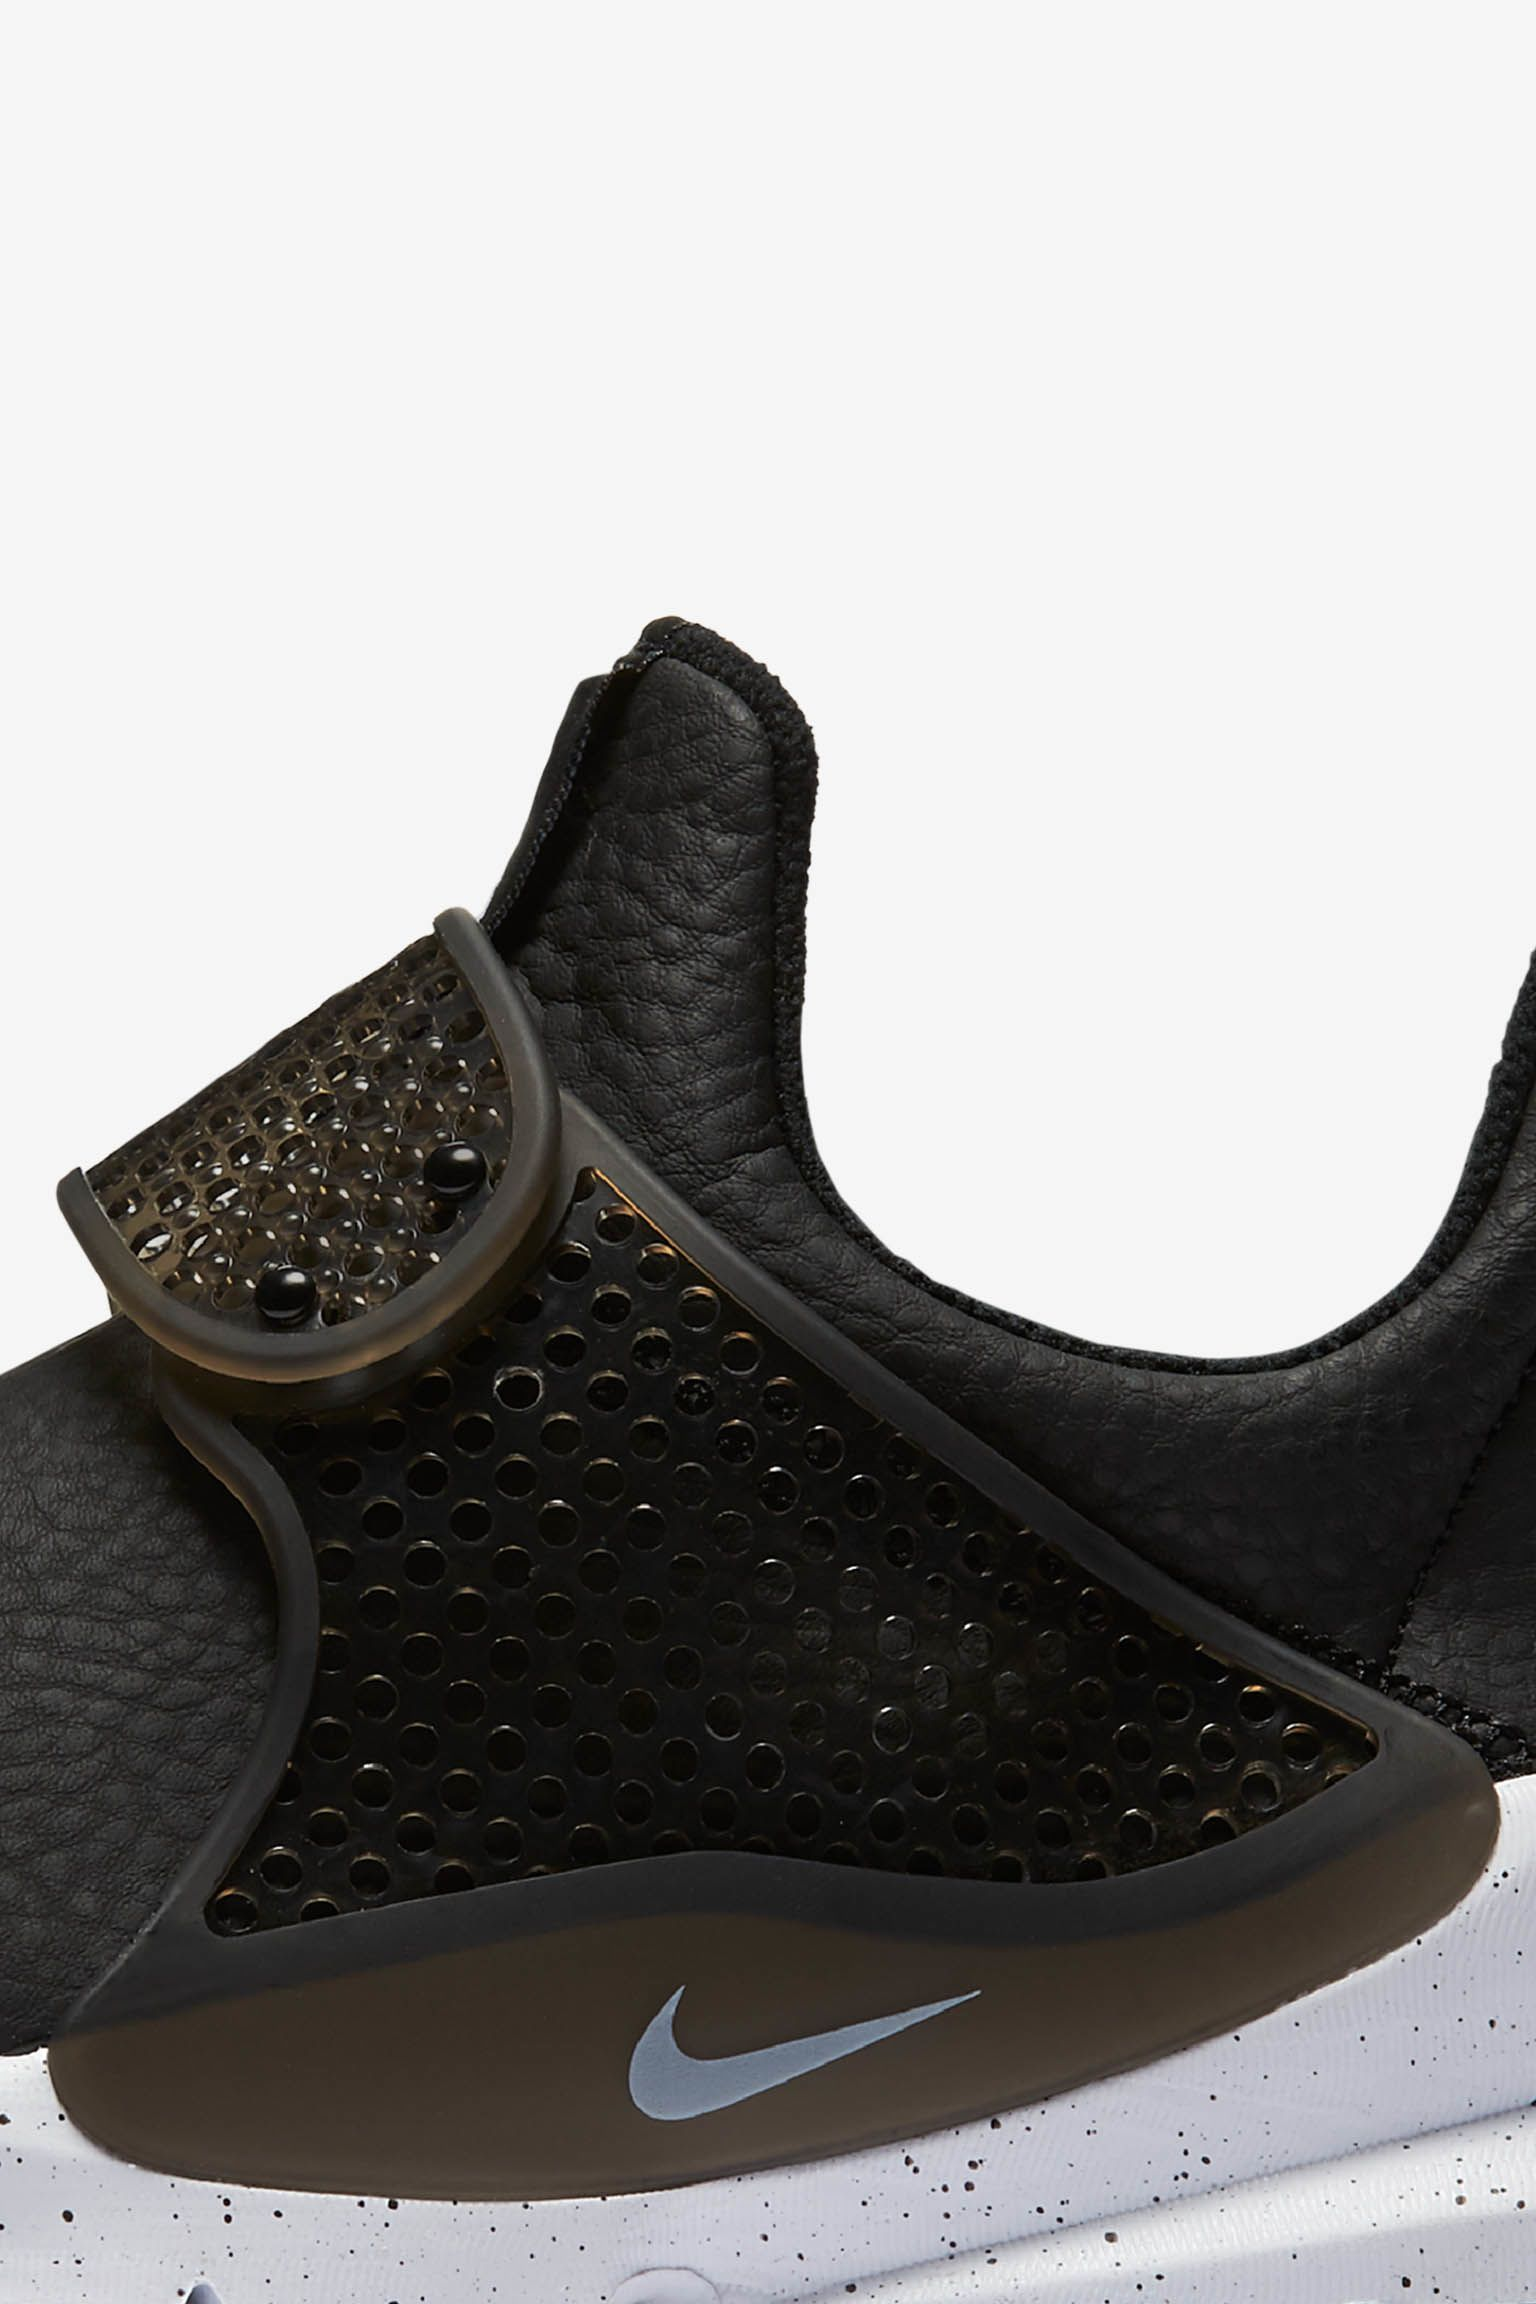 Women's Nike Sock Dart Premium 'Black & White' 2017